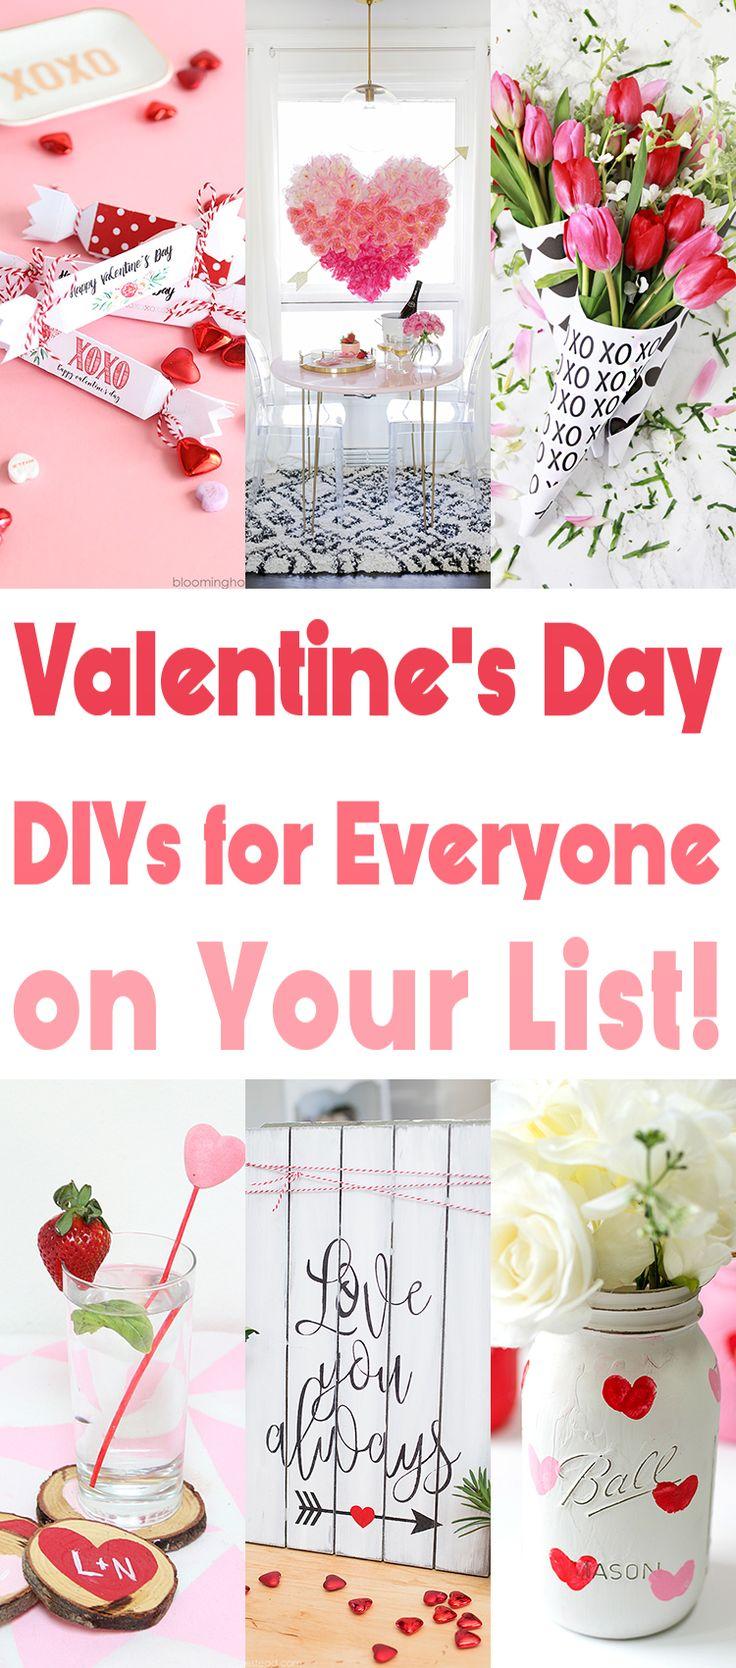 335 best holidays - valentine's day images on pinterest